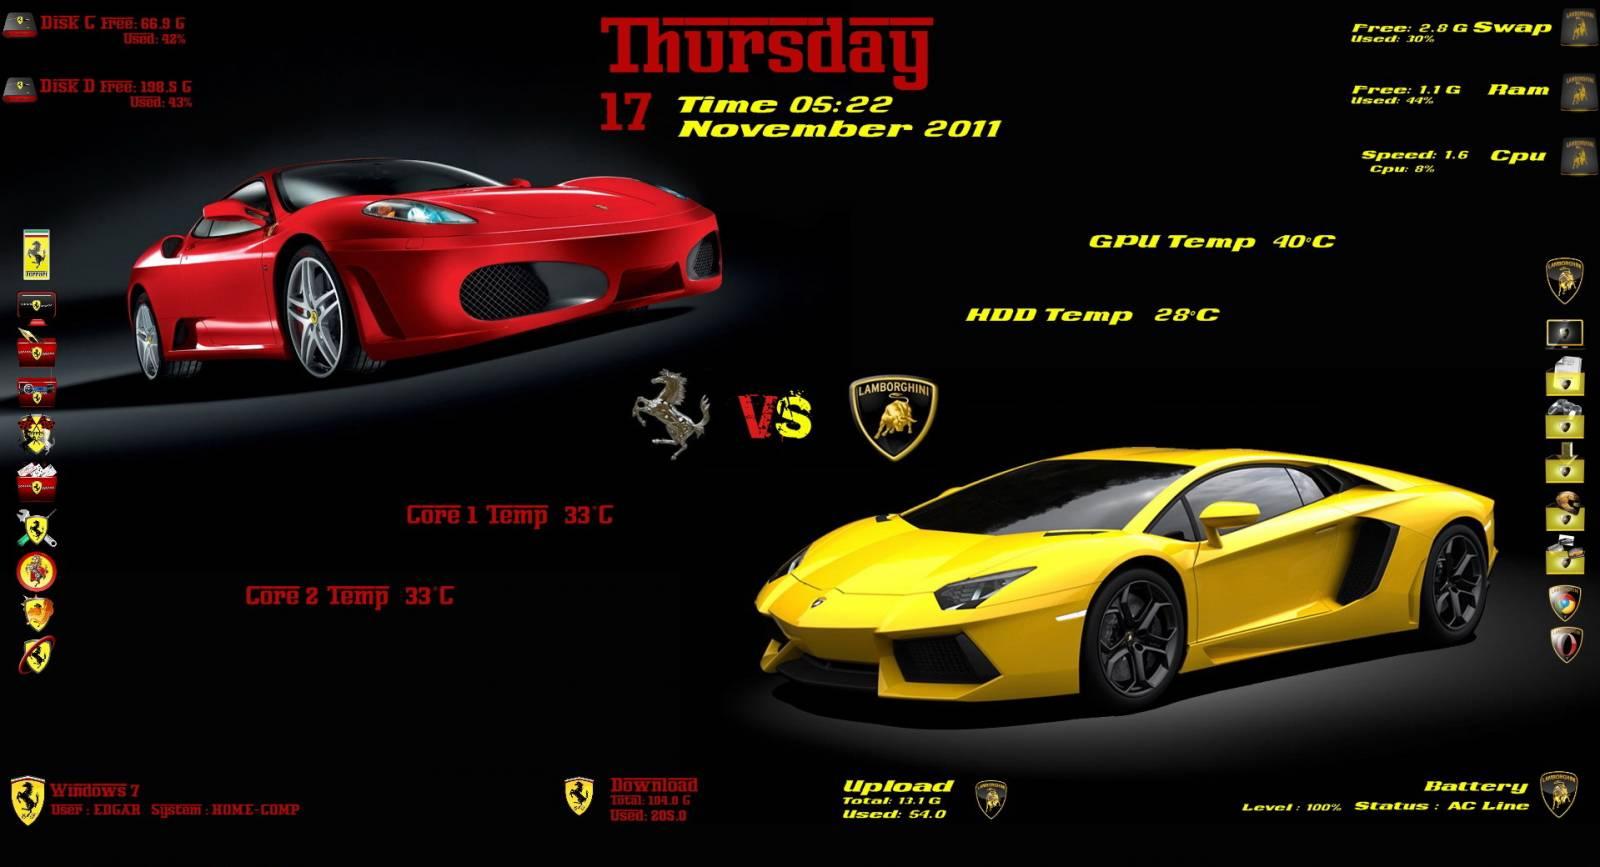 "Скин ""Ferrari vs Lamborghini"" для Rainmeter: 7themes.su/news/ferrari_vs_lamborghini/2011-11-17-143"